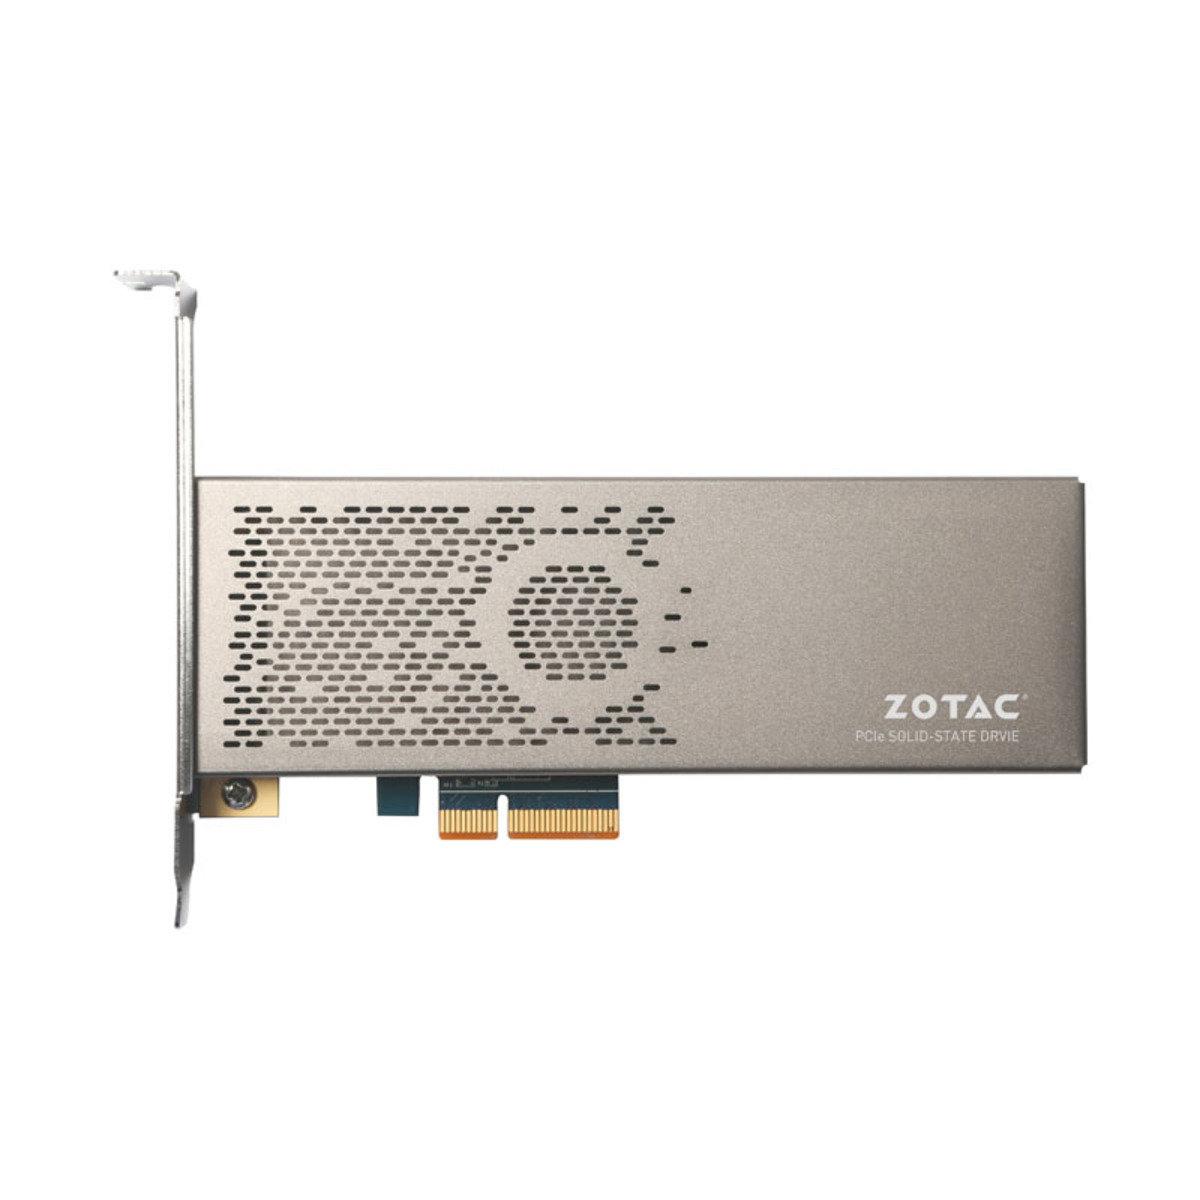 SSD 超高速NVMe內置固態硬碟 Sonix 480GB